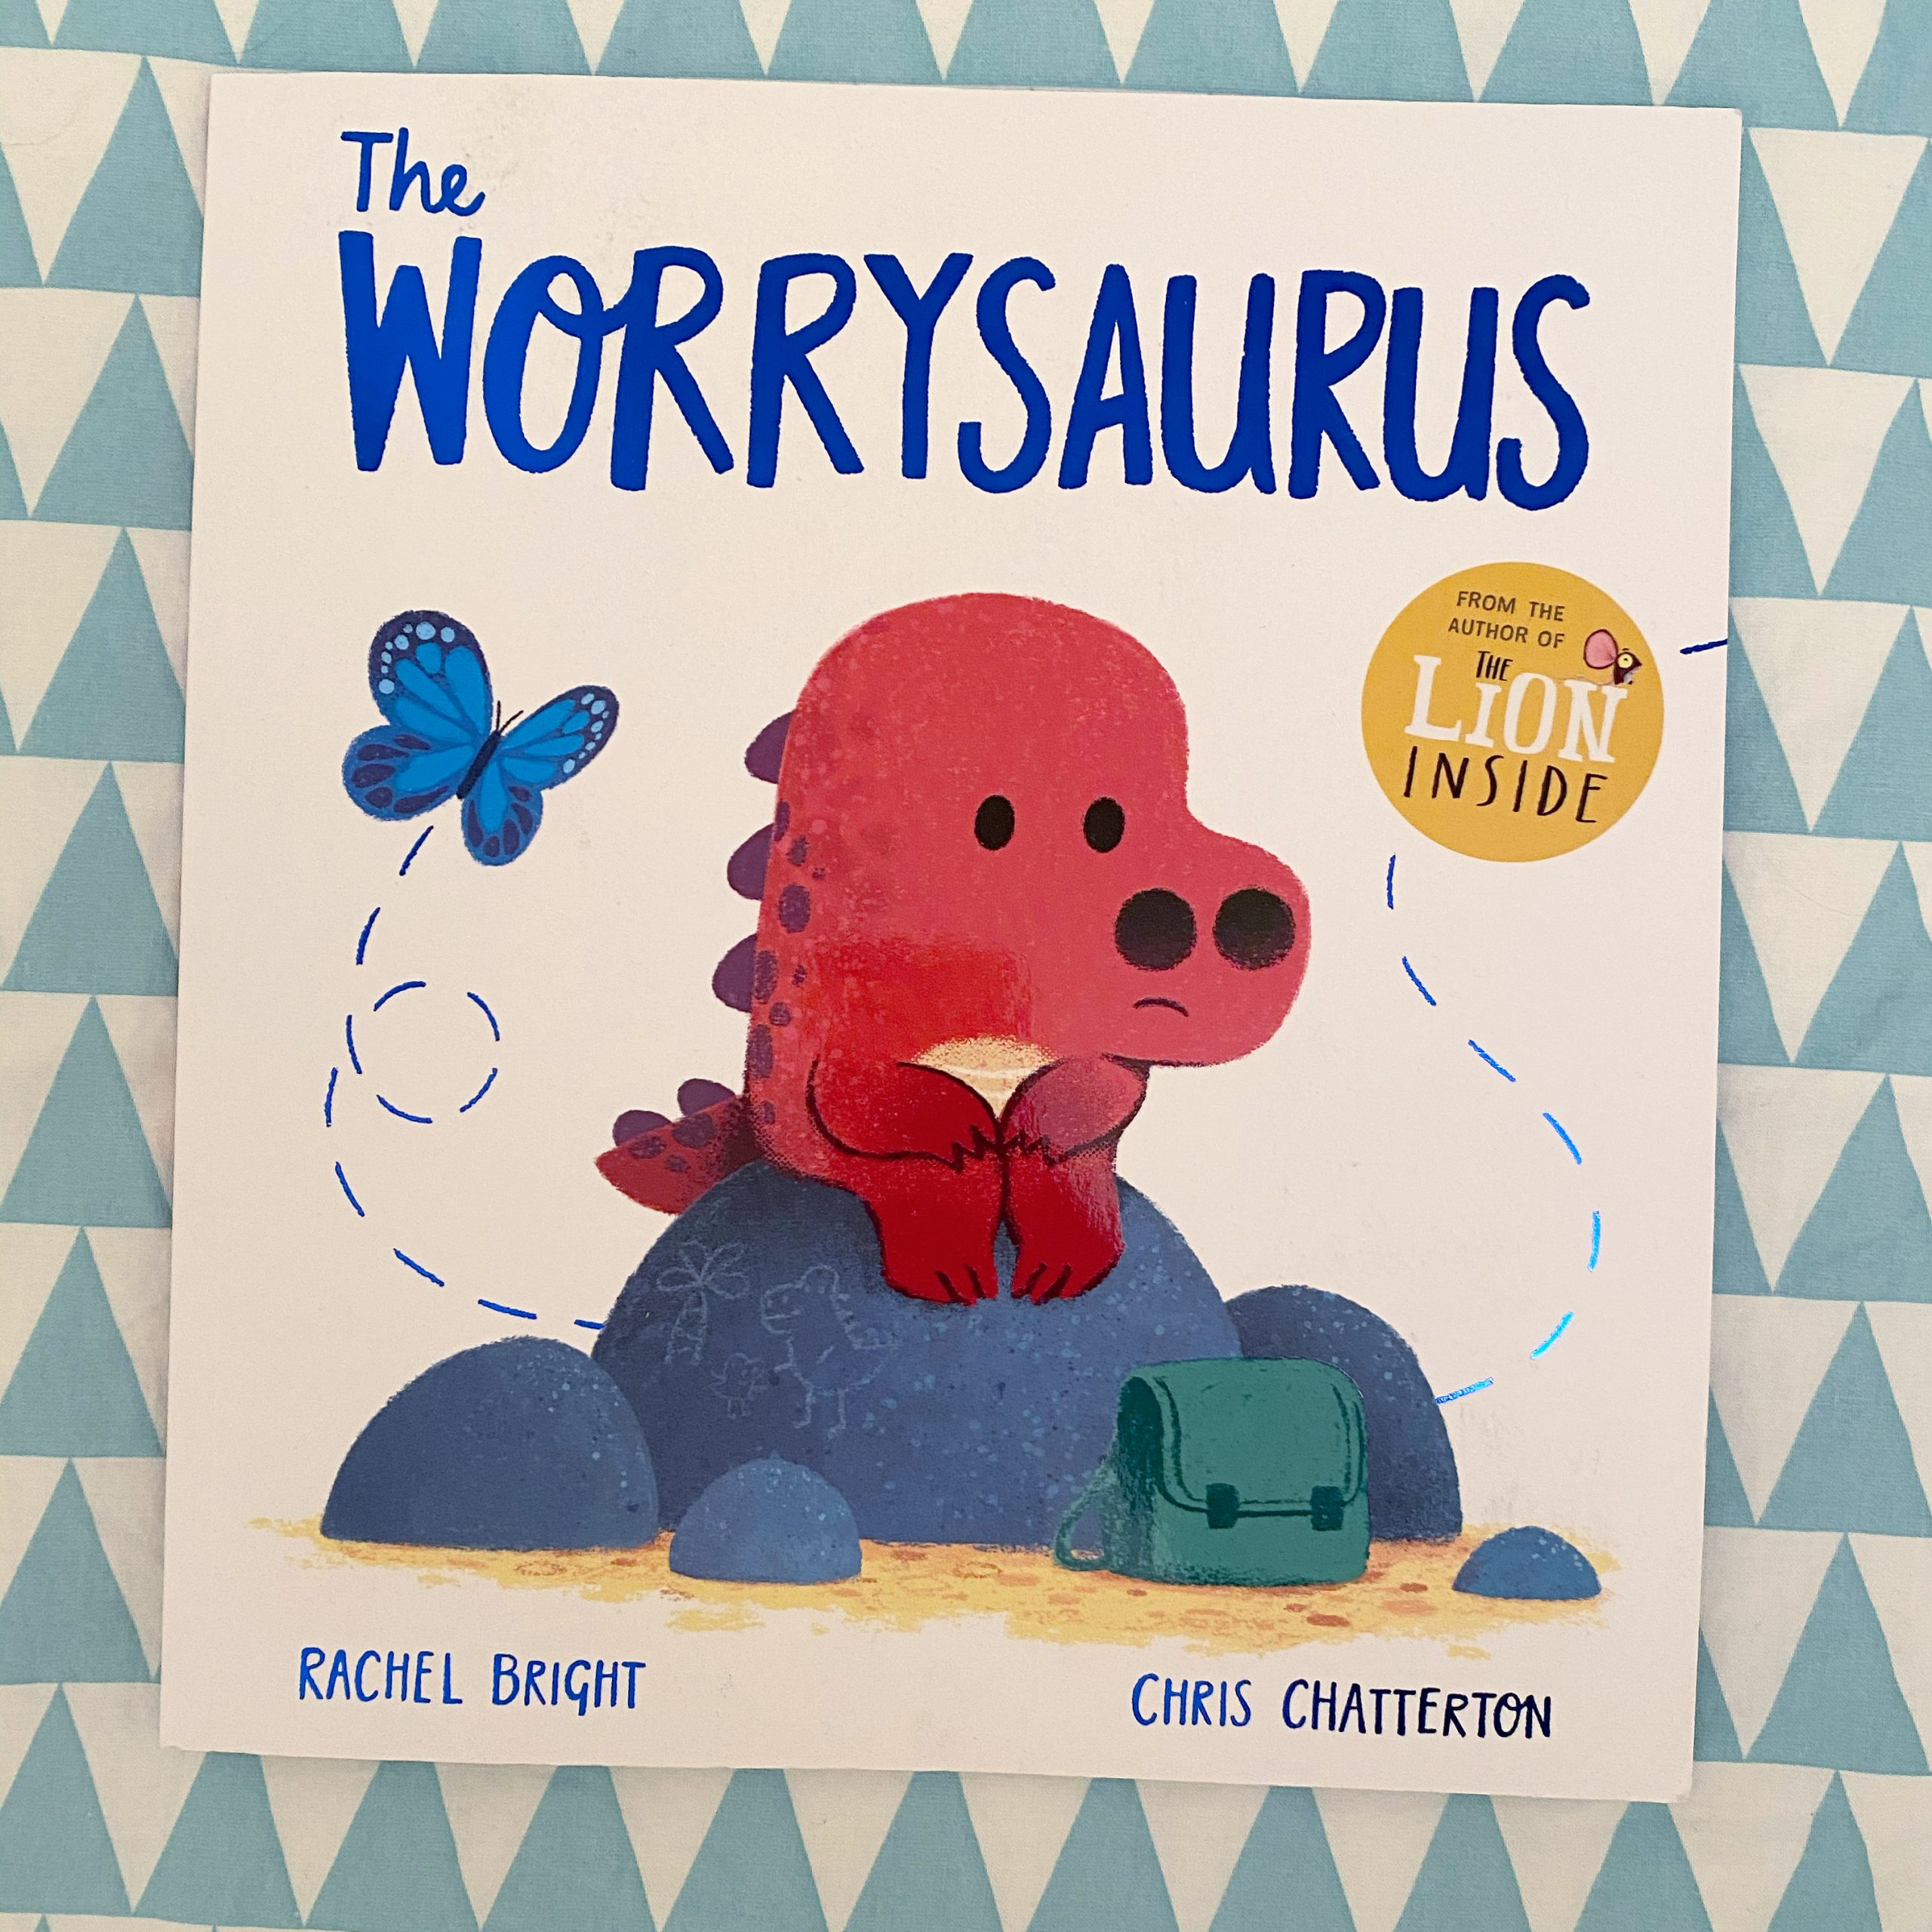 The worrysaurus book